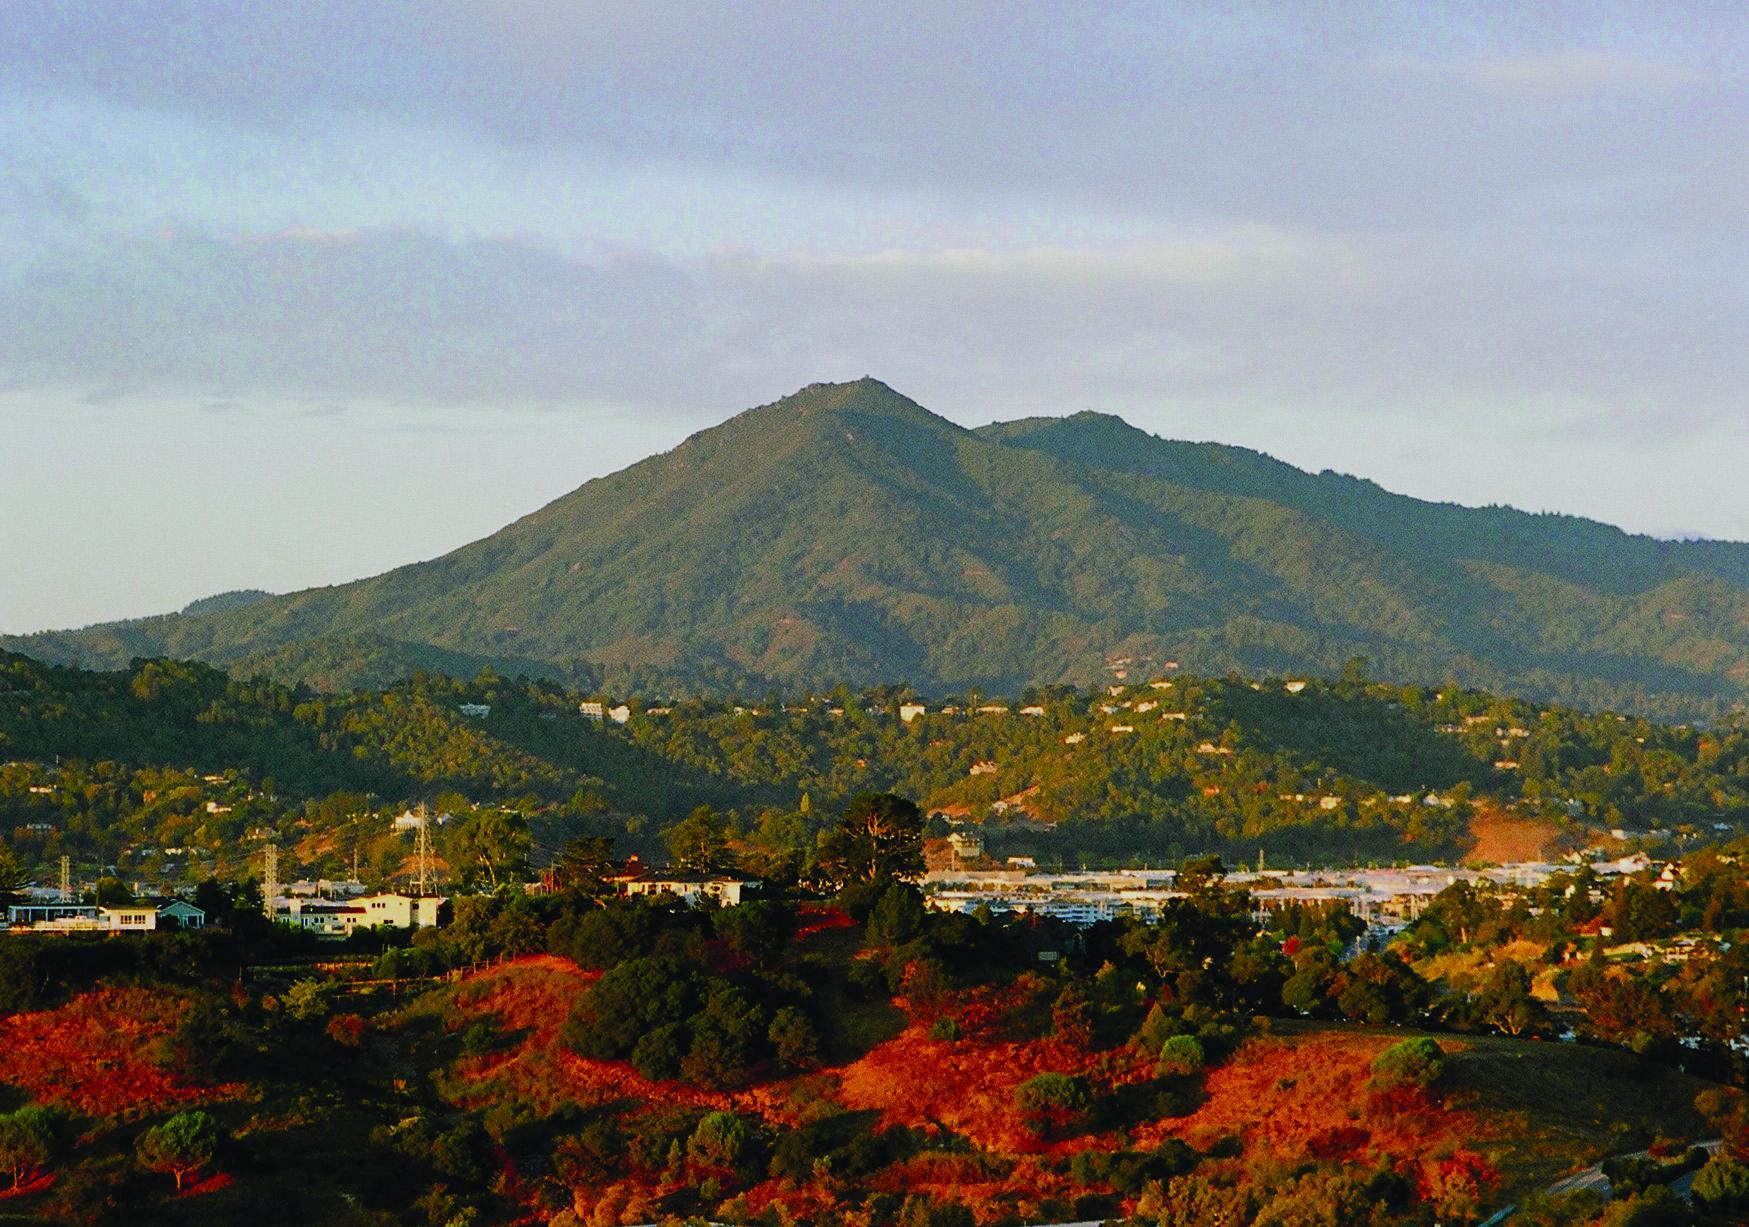 Mount Tamalpais State Park Camping Marin Convention Visitors Bureau